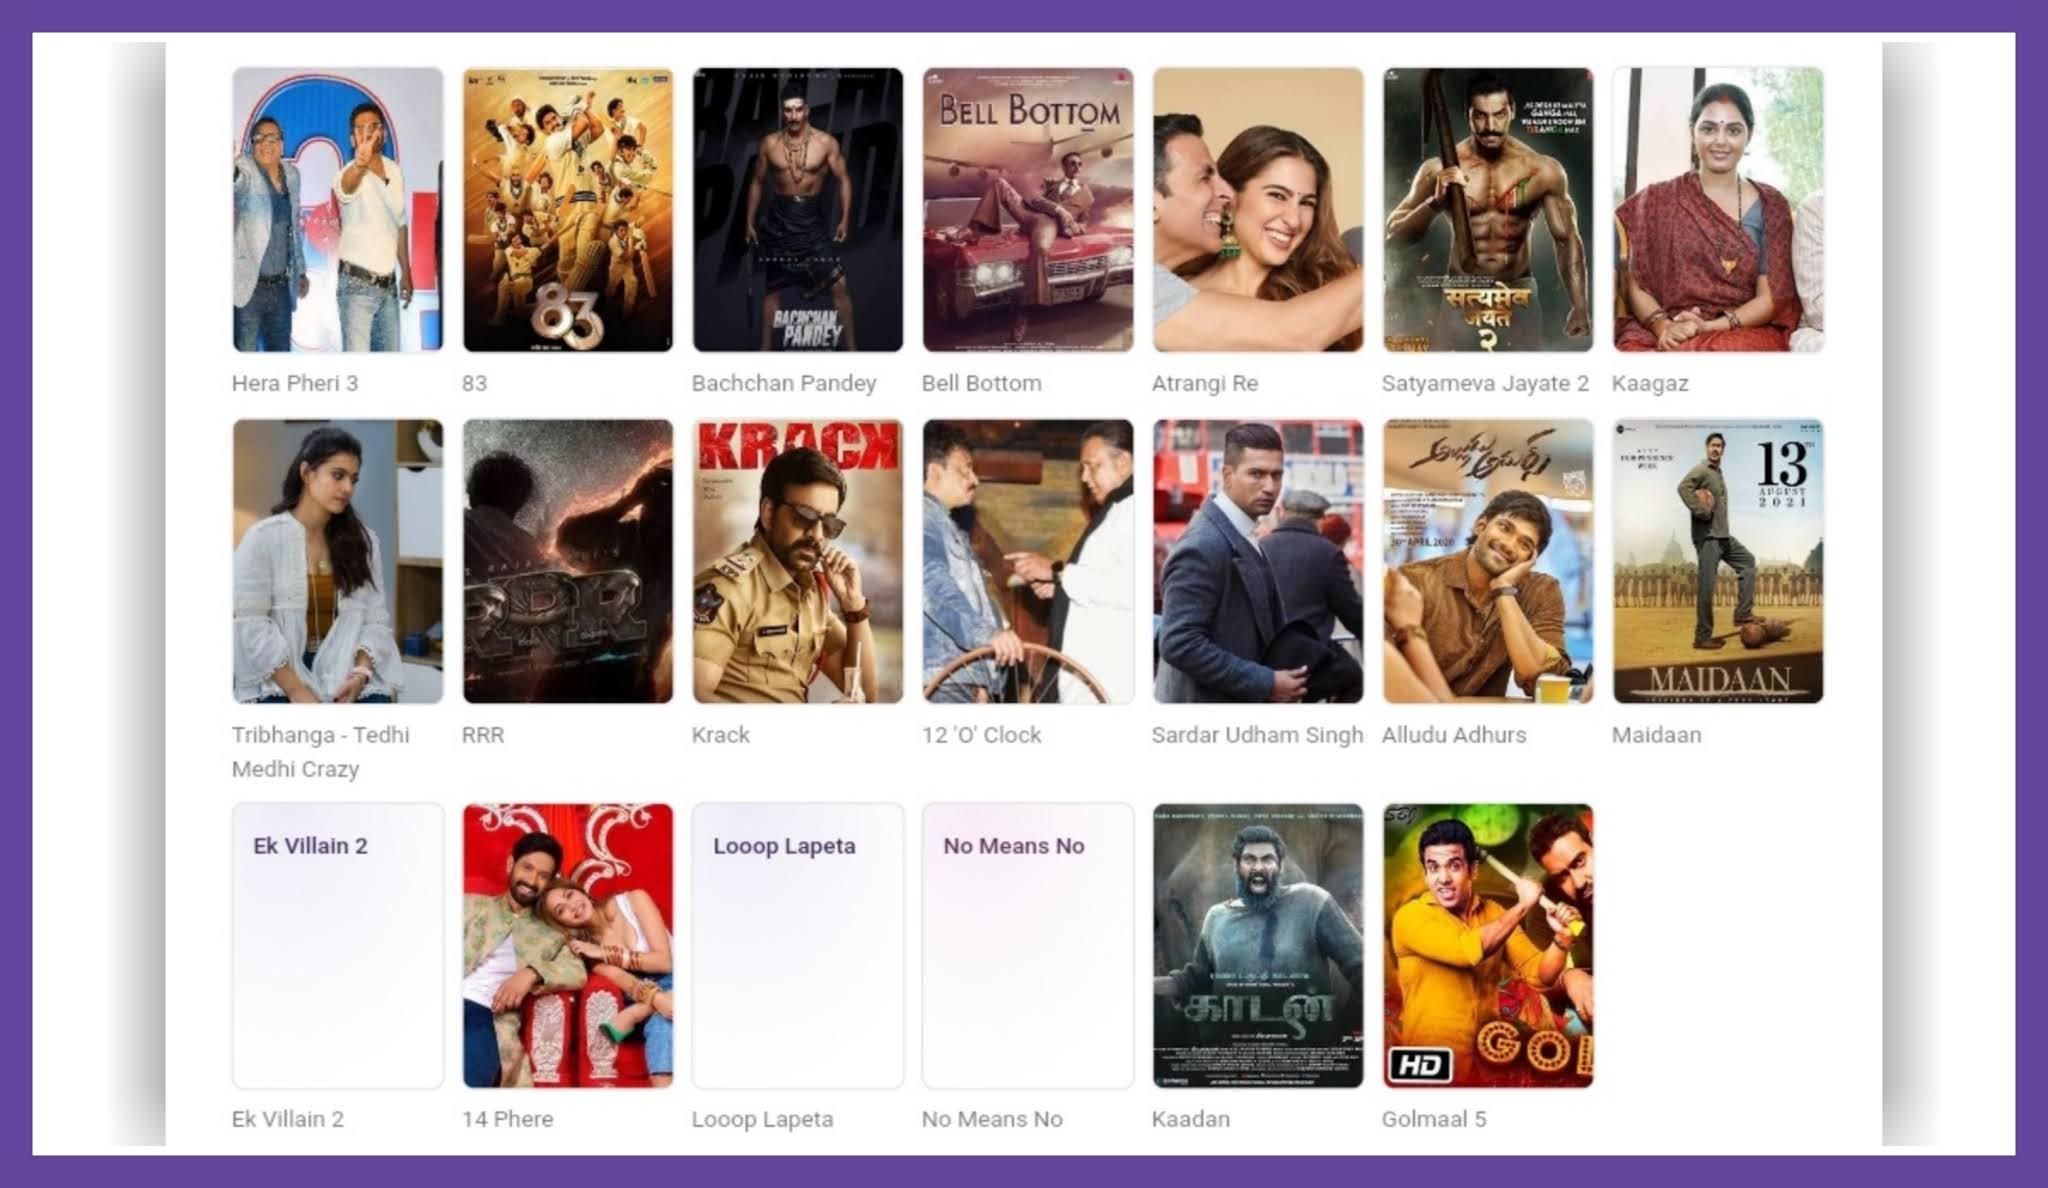 Hindi movies releasing this Weekend Upcoming movies 2020 Bollywood movies 2019 upcoming bollywood movies 2020 list of bollywood movies 2022 of bollywood movies 2020 hollywood movies list list of bollywood movies 2019 bollywood movies 2018 bollywood movies list 2018 and 2019 hindi movies